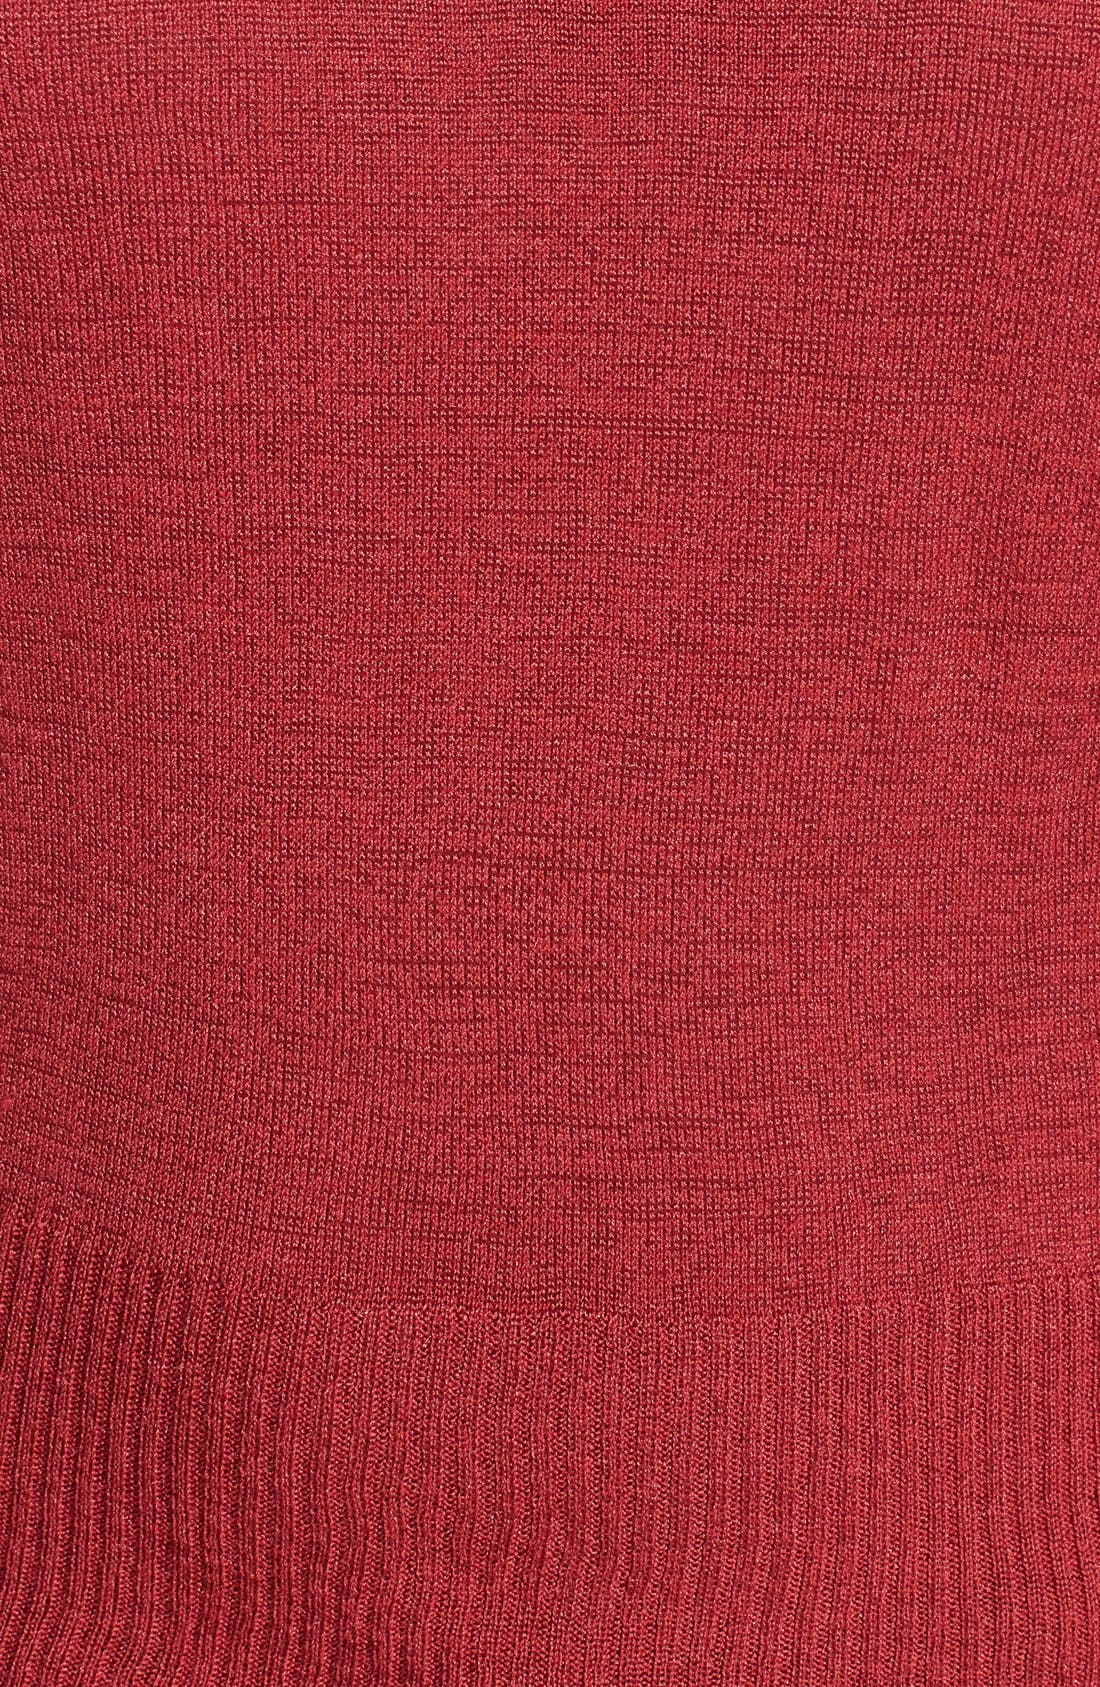 Alternate Image 3  - NIC+ZOE 'Easy' Ribbed Pullover (Regular & Petite)